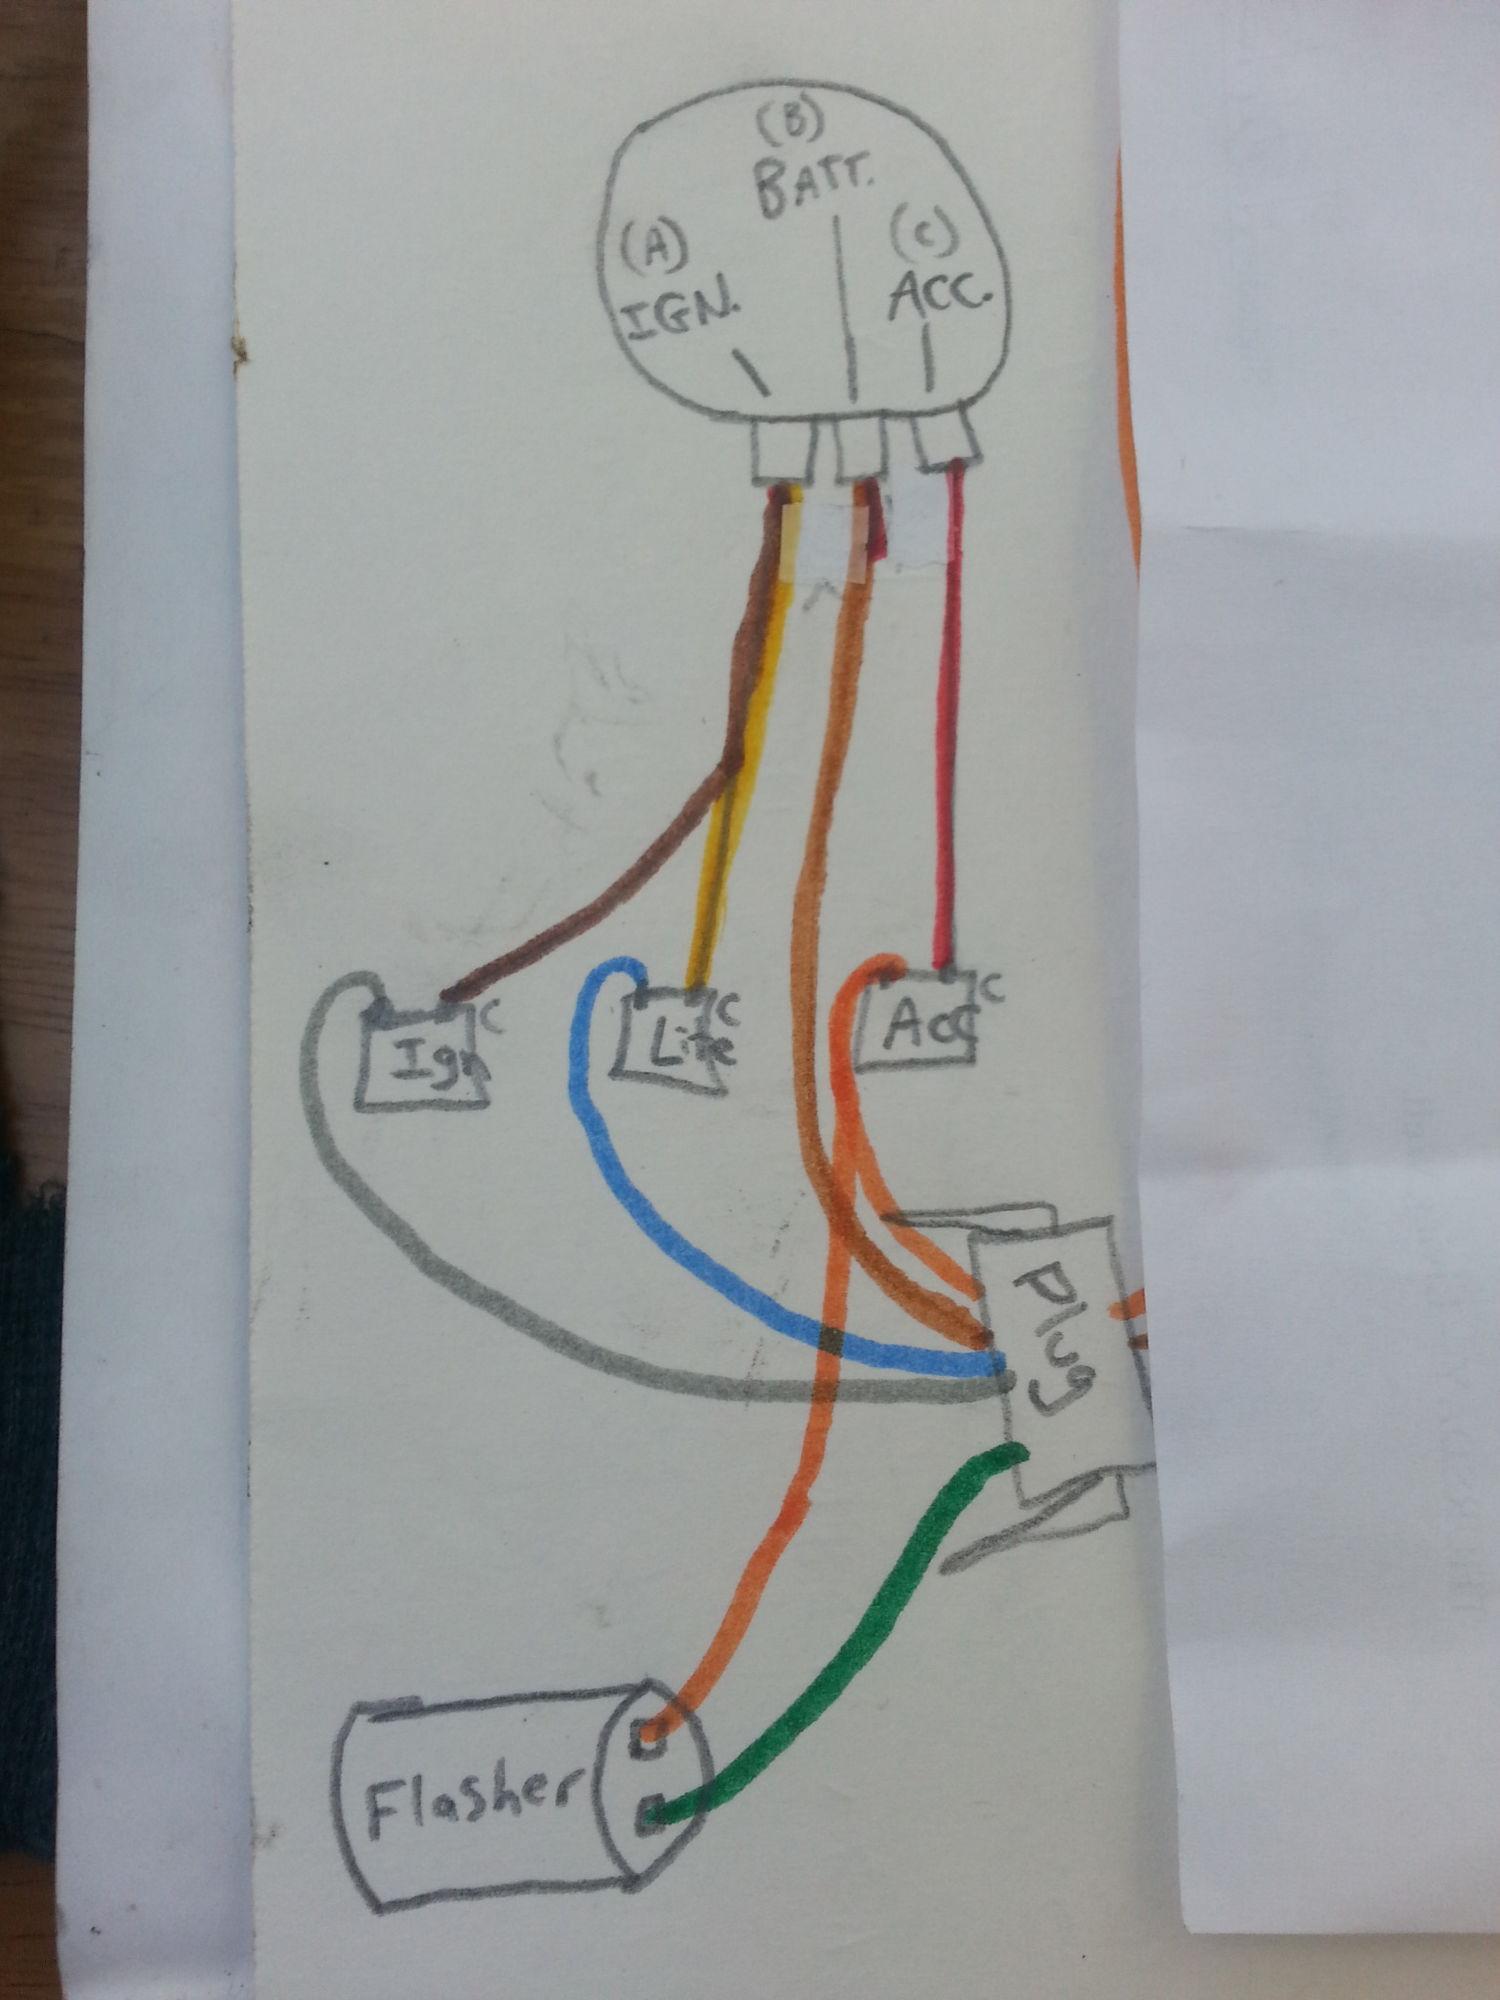 hight resolution of pole wiring diagram image wiring diagram harley 6 pole wiring diagram kawasaki kz1000 universal wiring on